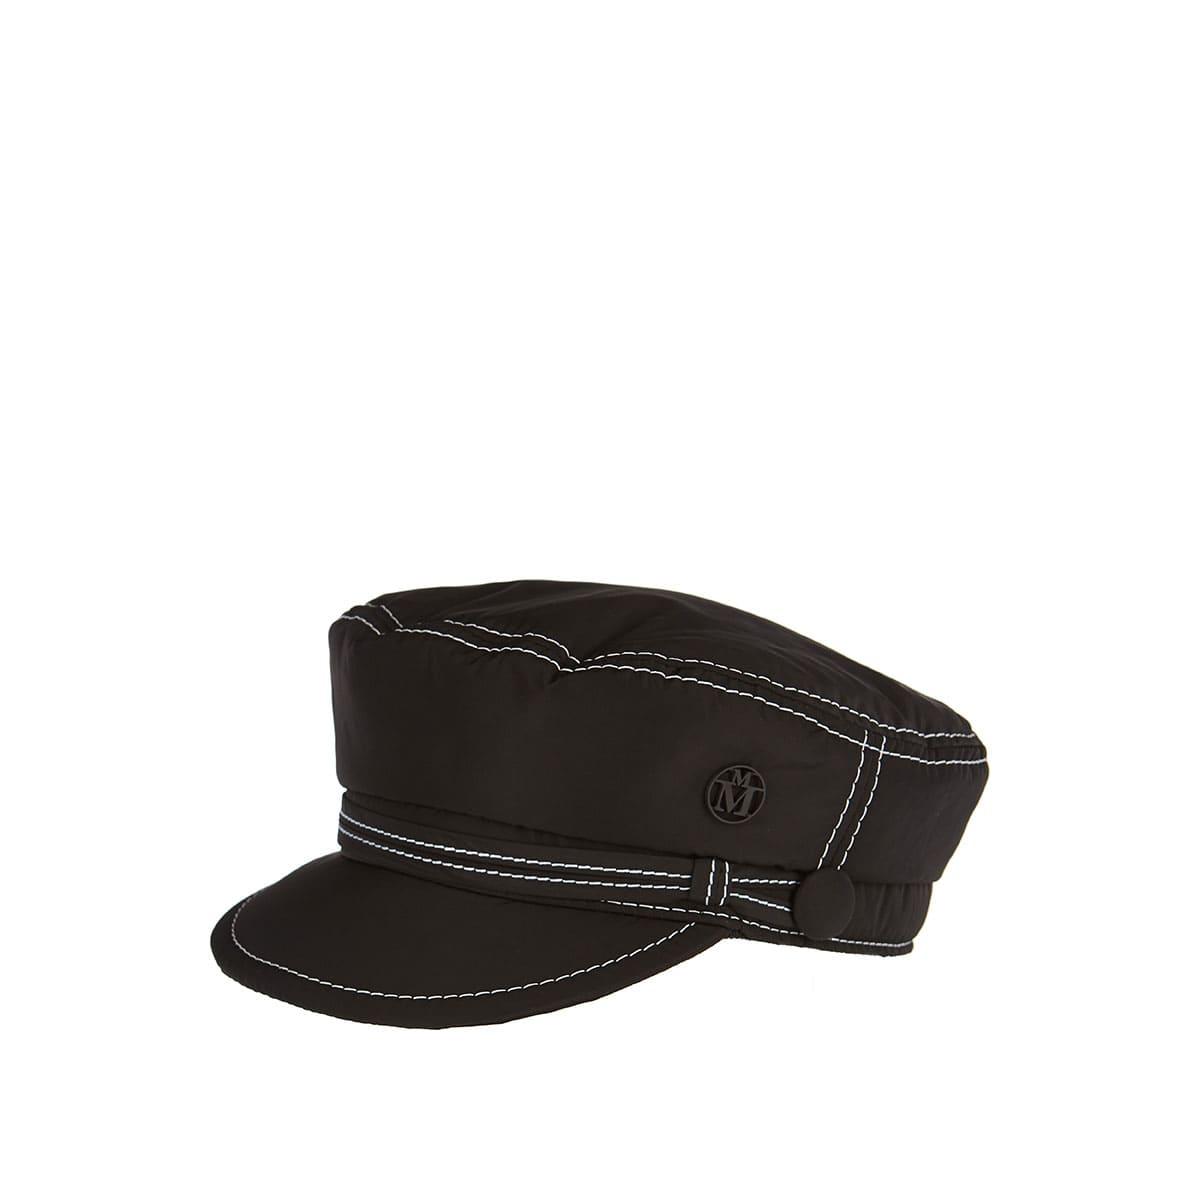 Soft New Abby nylon cap